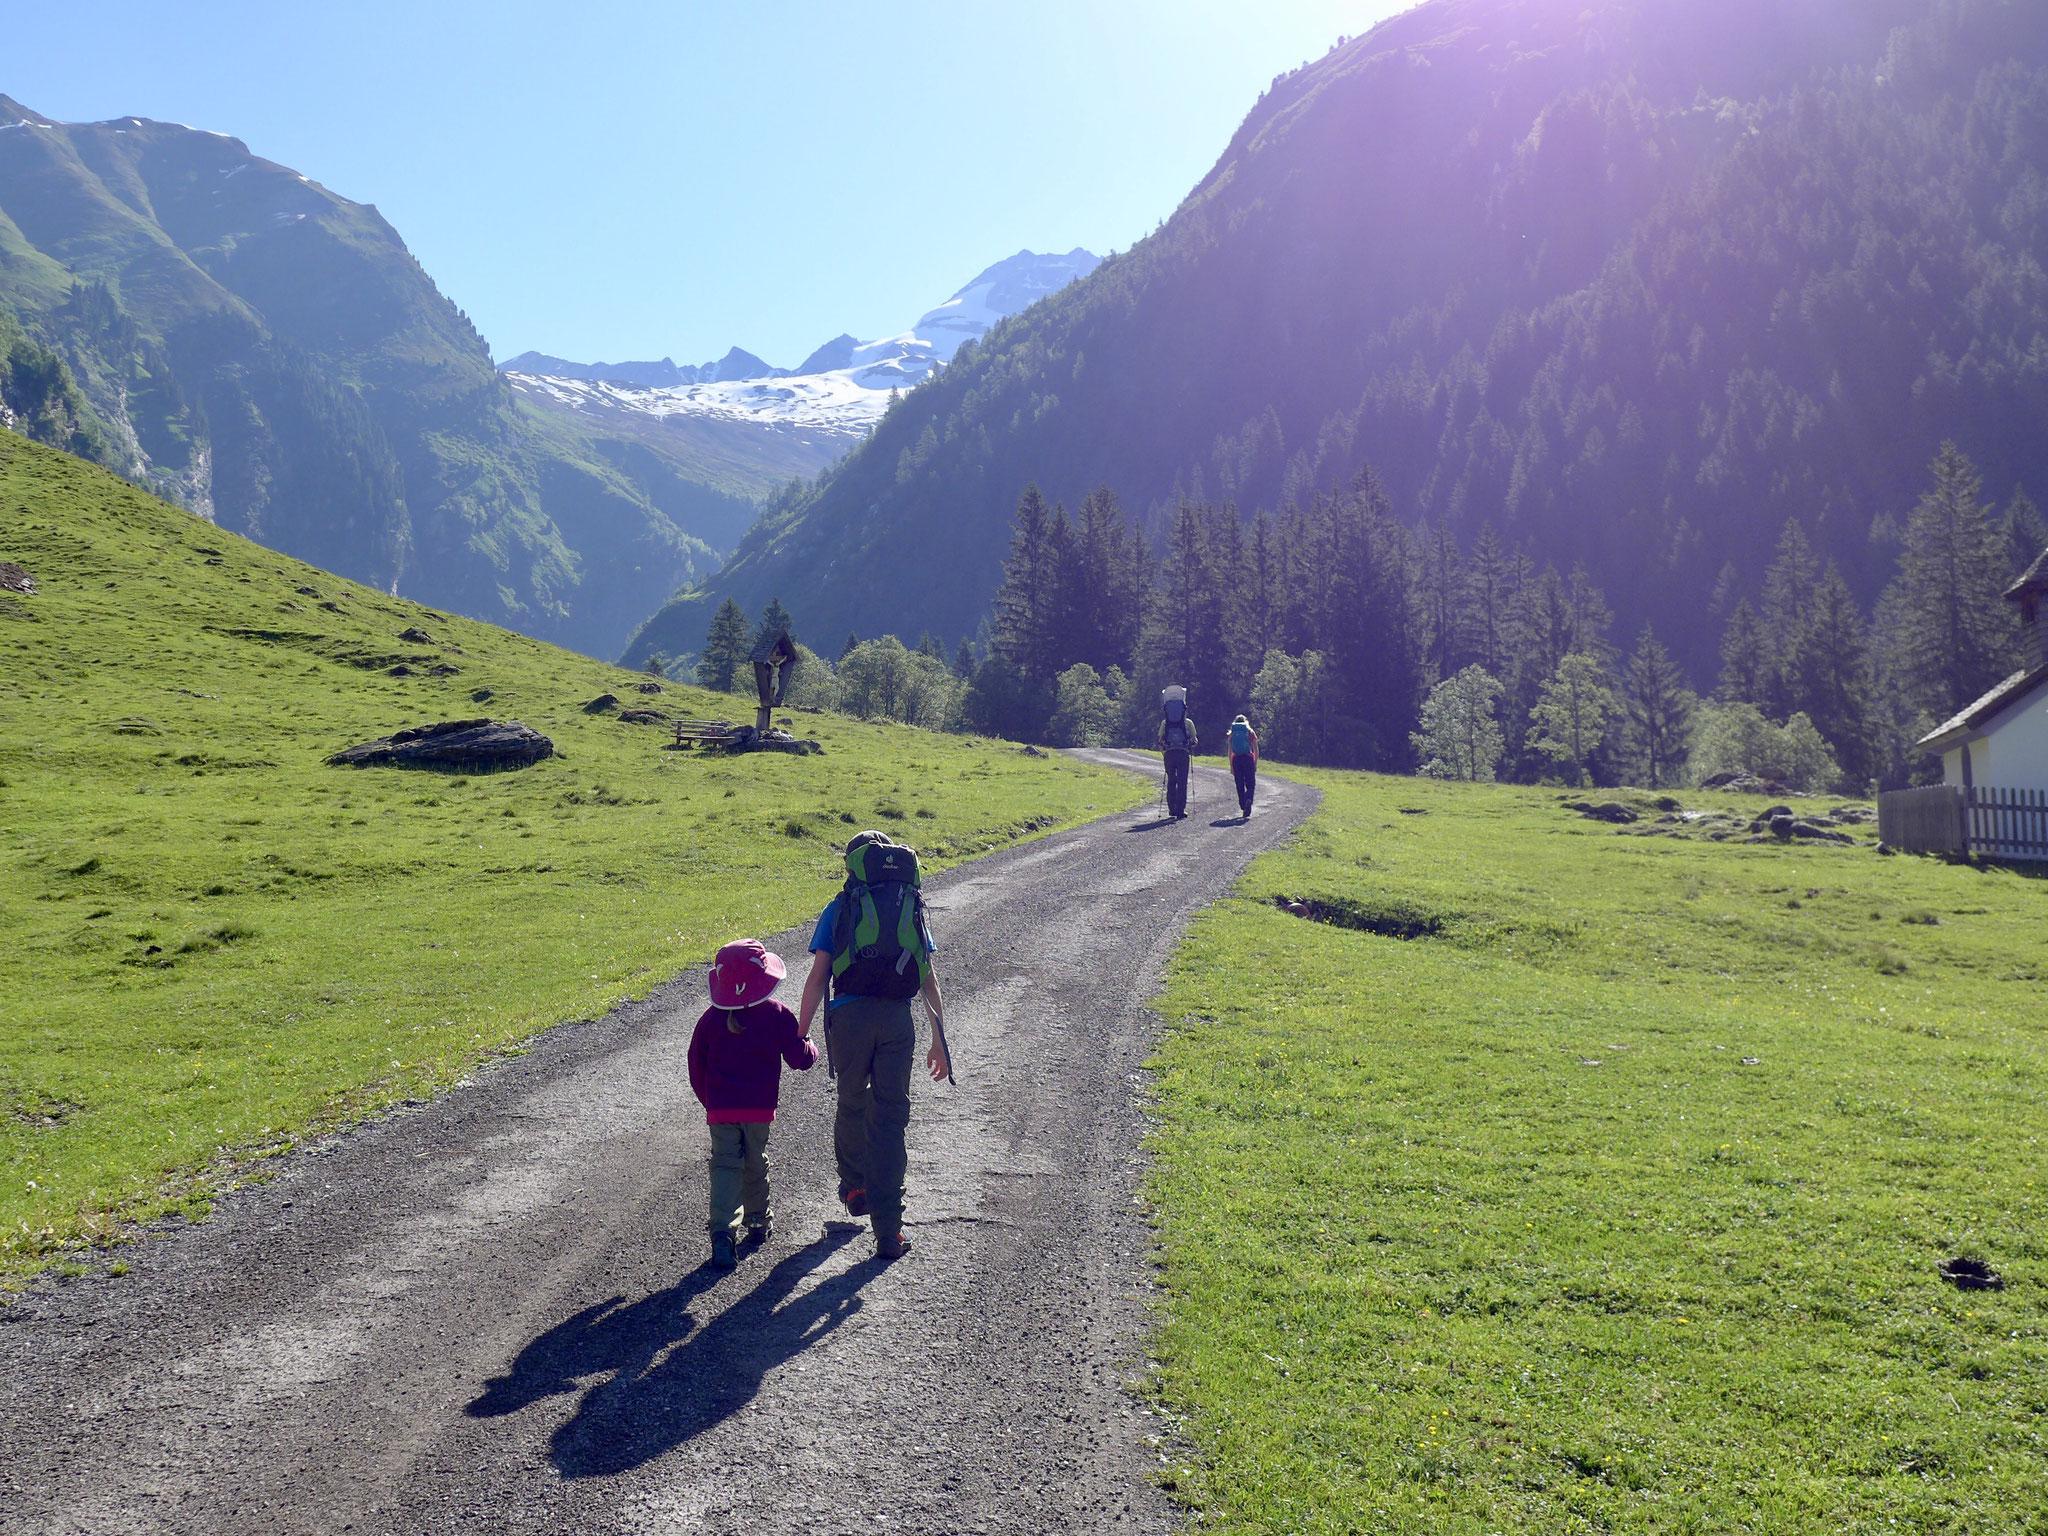 Los gehts Richtung Geraer Hütte.